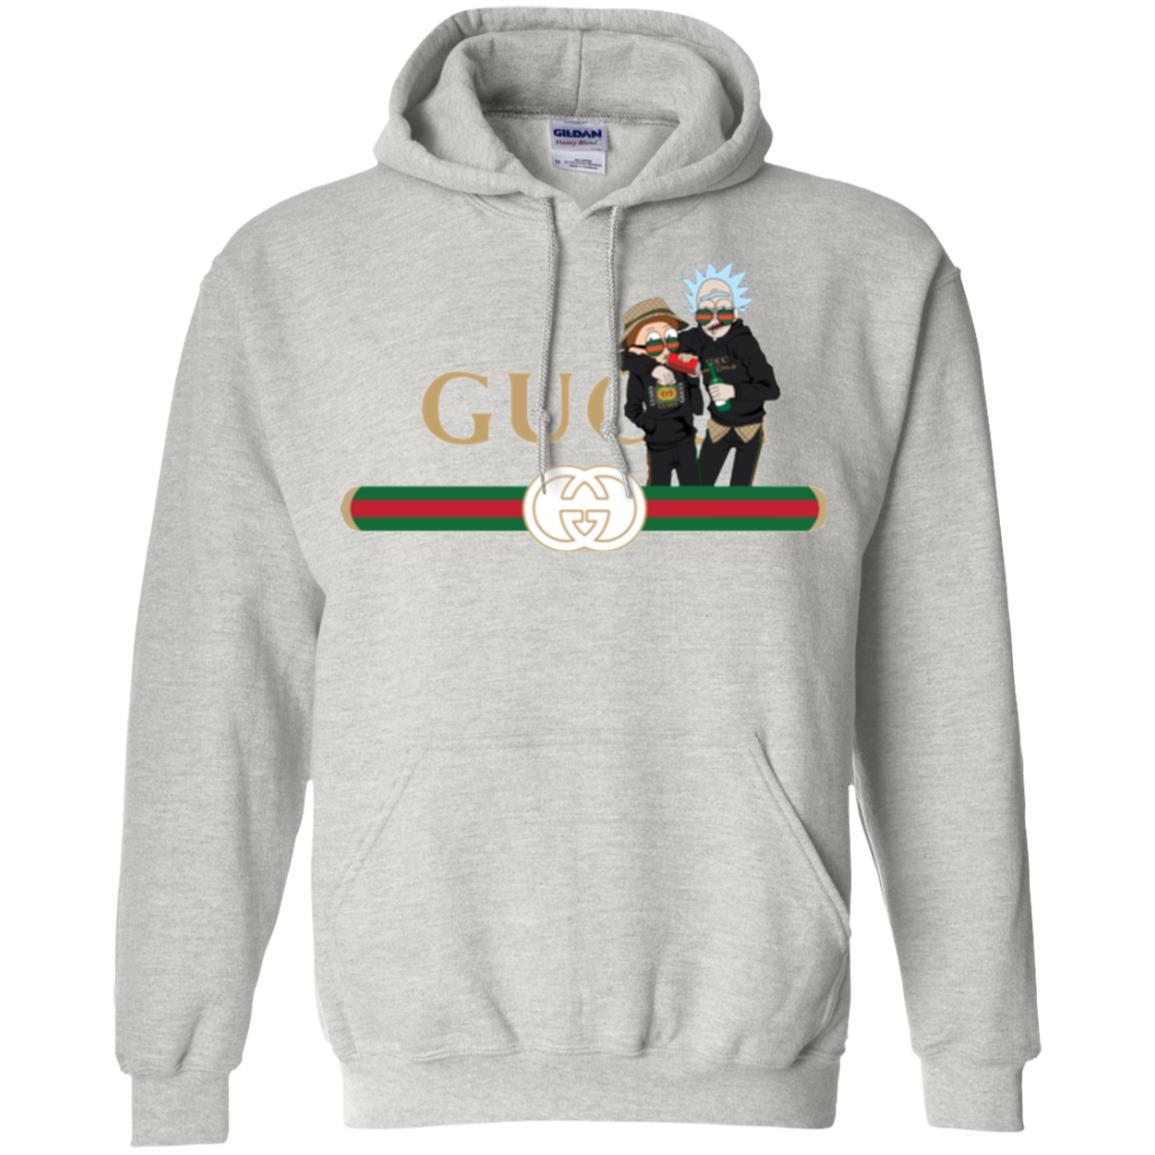 image 219px Rick and Morty Gucci Mashup T shirts, Hoodies, Tank